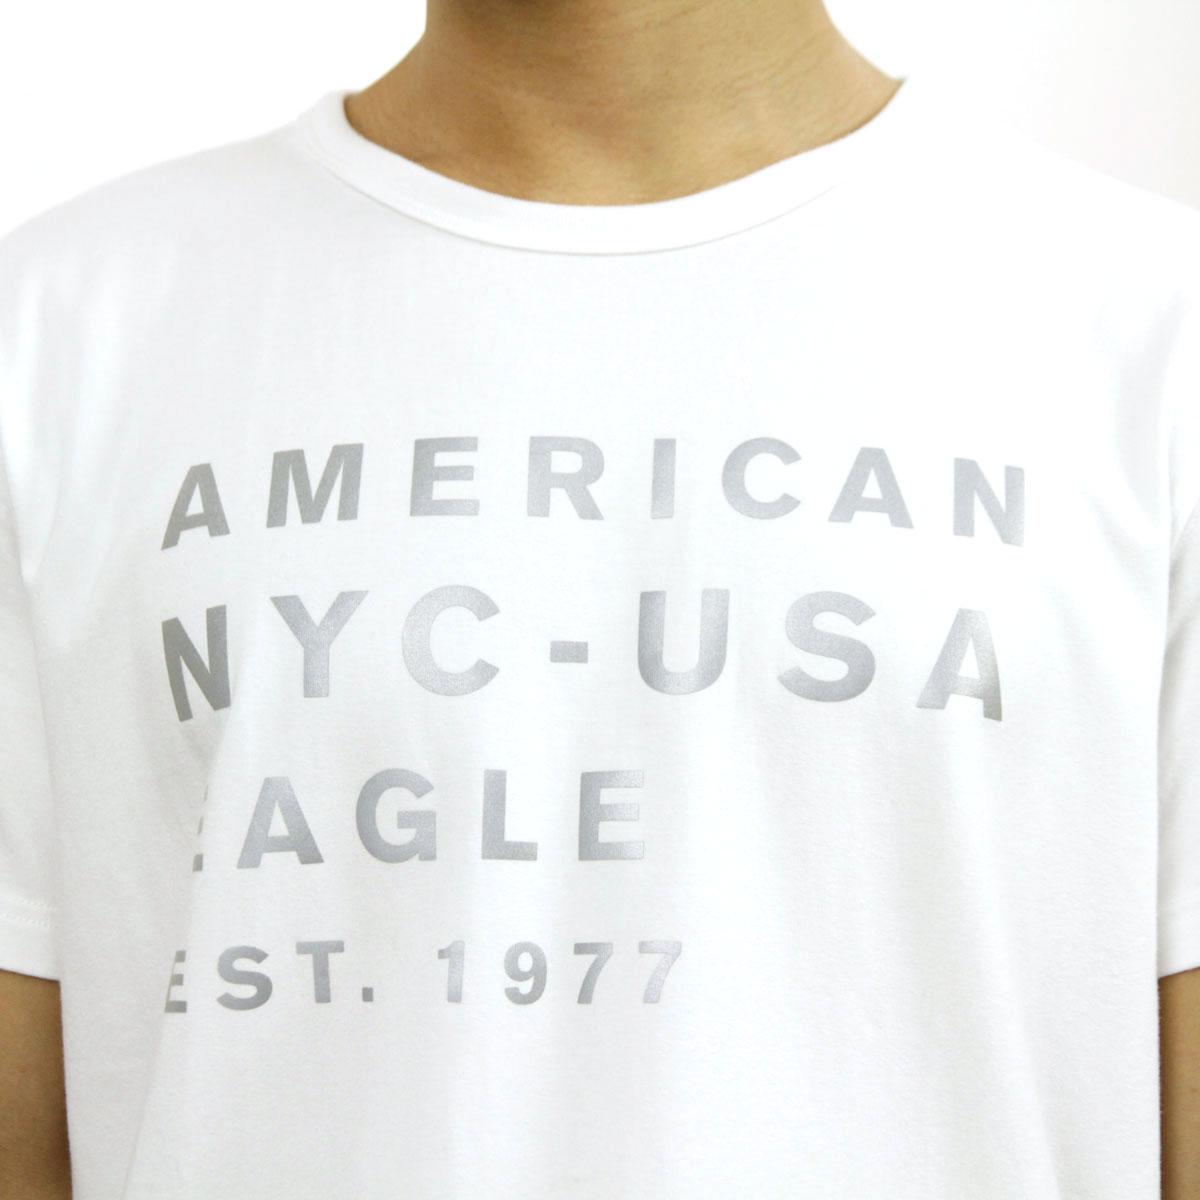 e59e2f7f9 ... American eagle AMERICAN EAGLE regular article men crew neck short  sleeves T-shirt AE REFLECTIVE ...